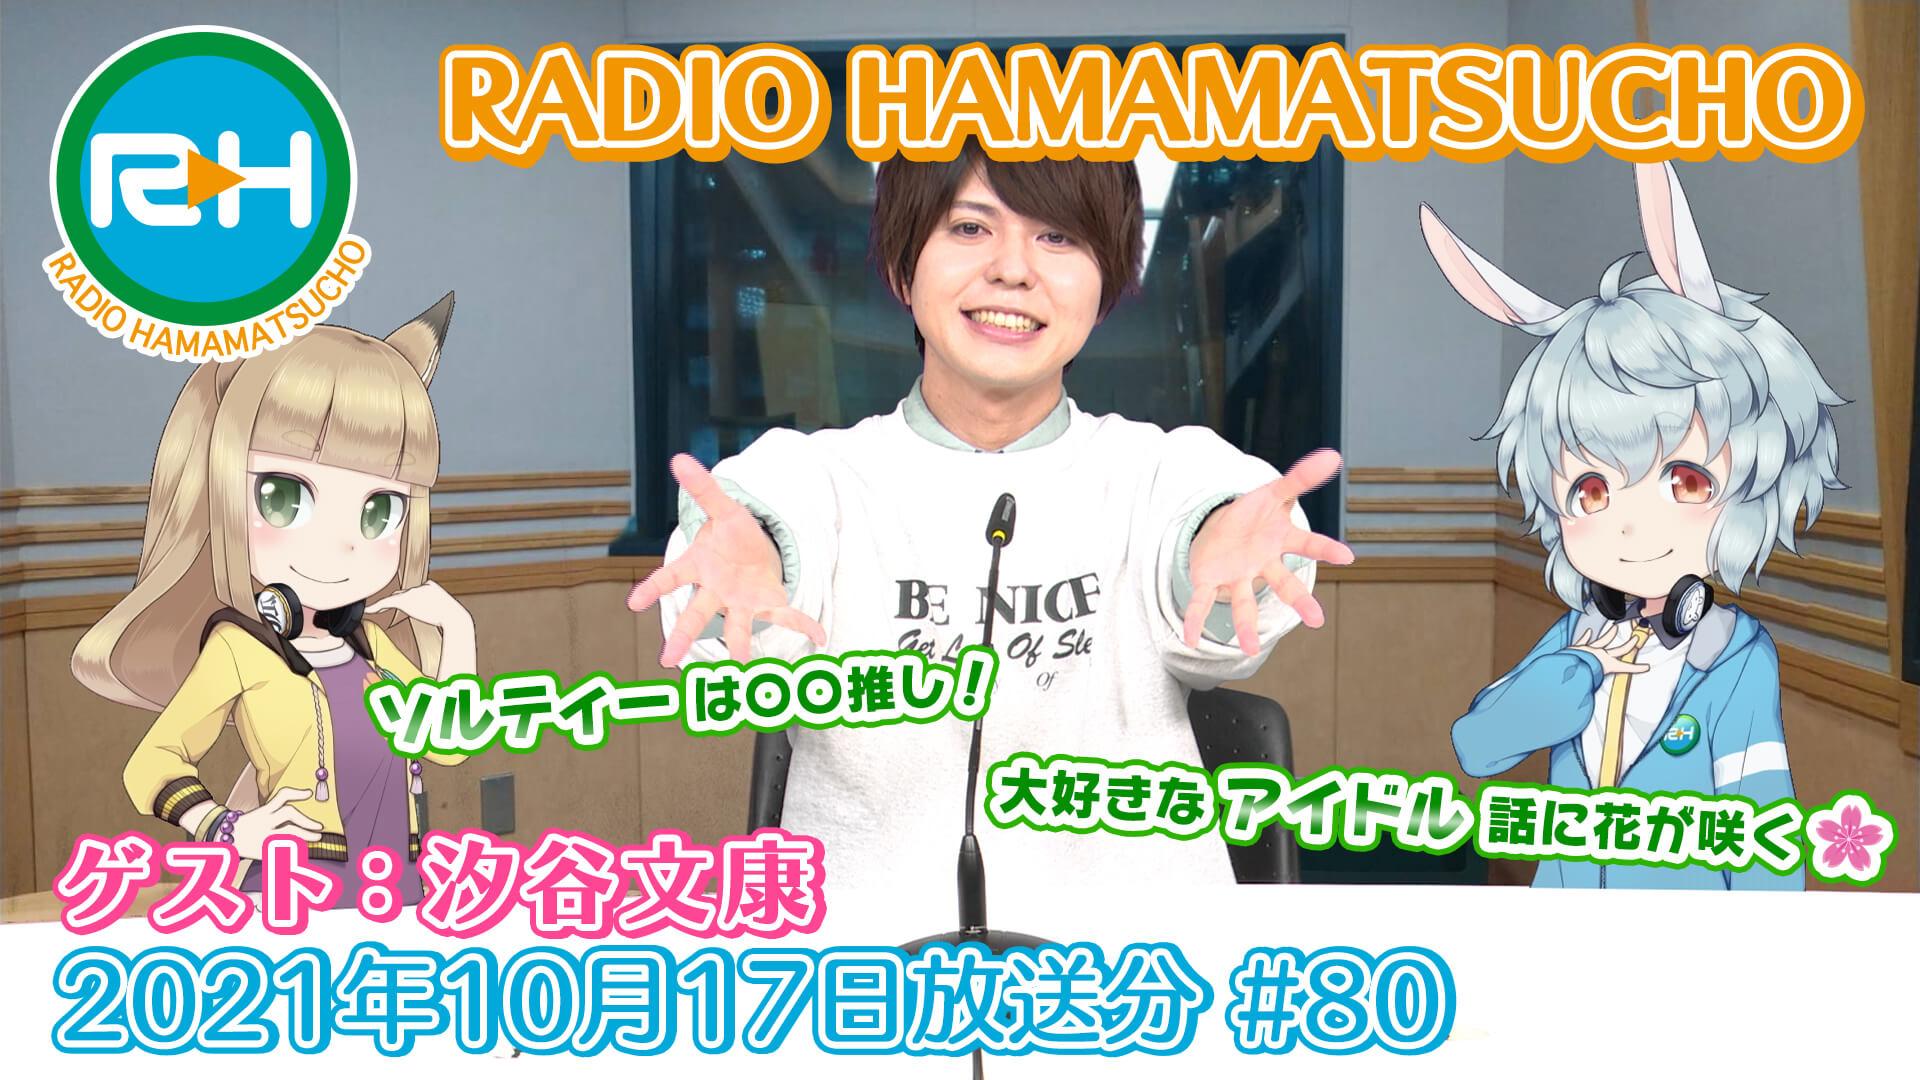 RADIO HAMAMATSUCHO 第80回 (2021年10月17日放送分) ゲスト: 汐谷文康